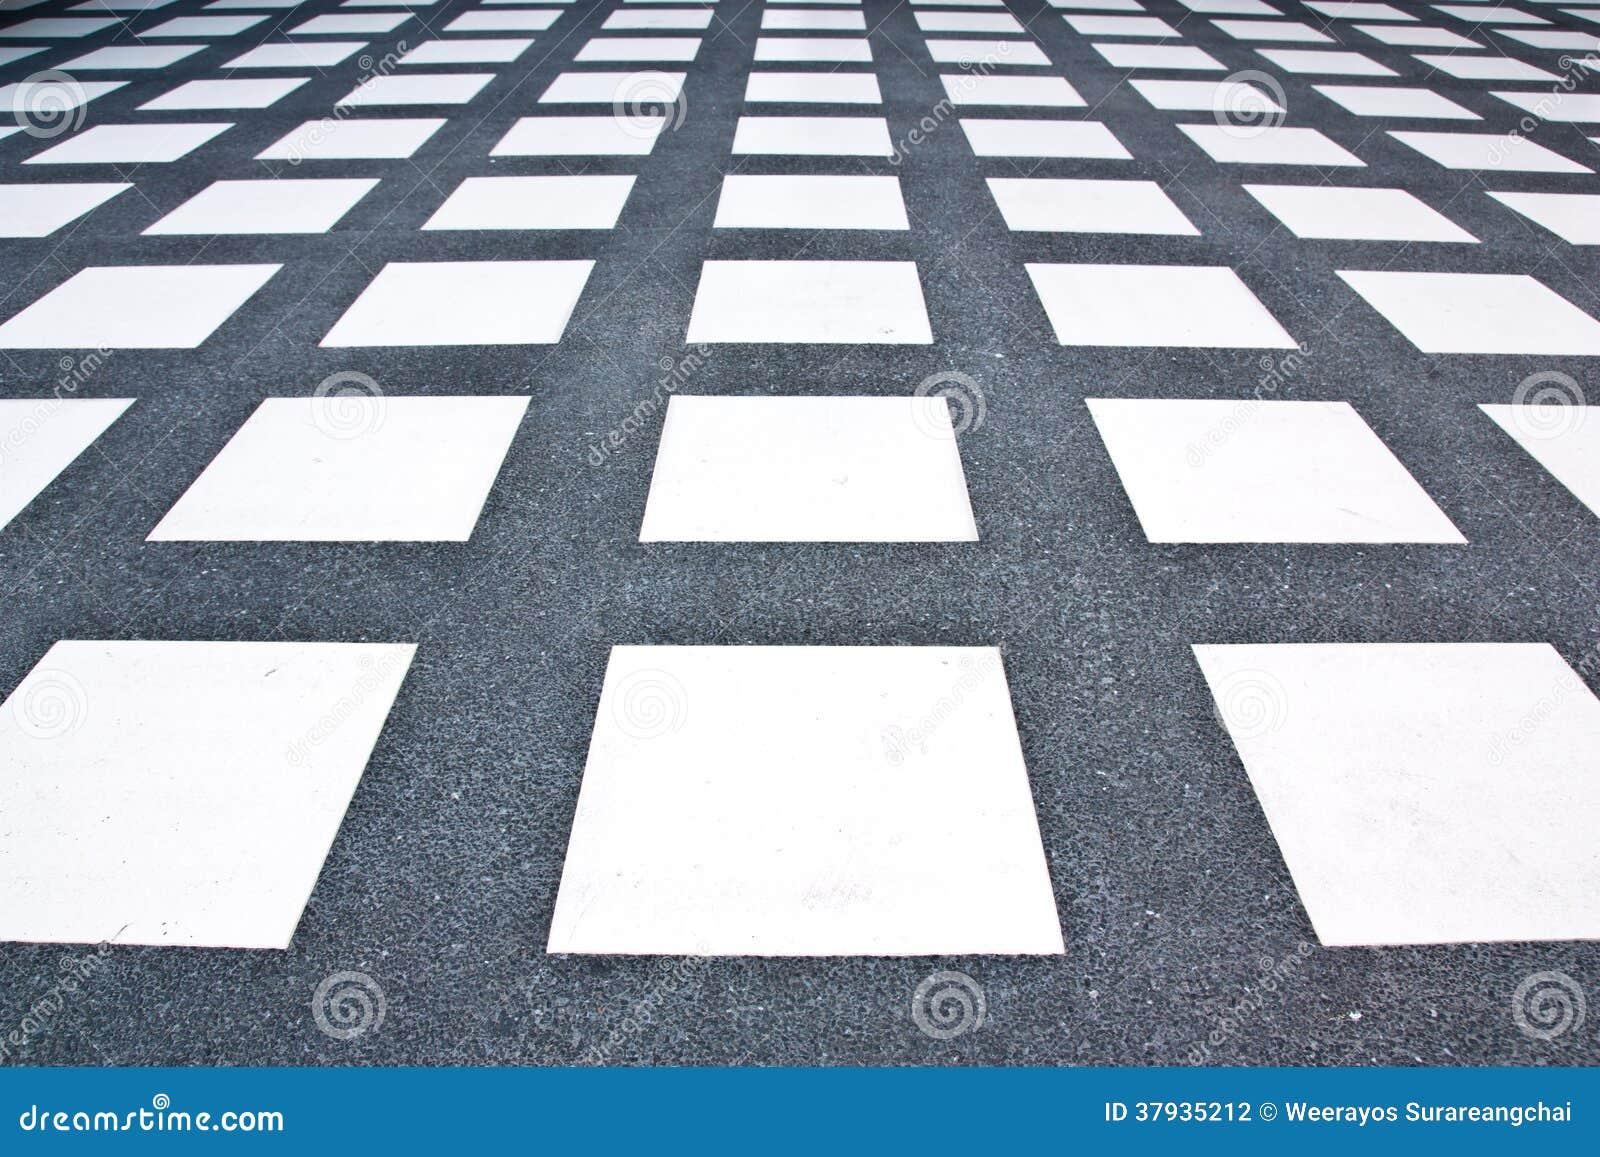 Floor tile pattern white rectangle stock photo image 37935212 floor tile pattern white rectangle dailygadgetfo Images